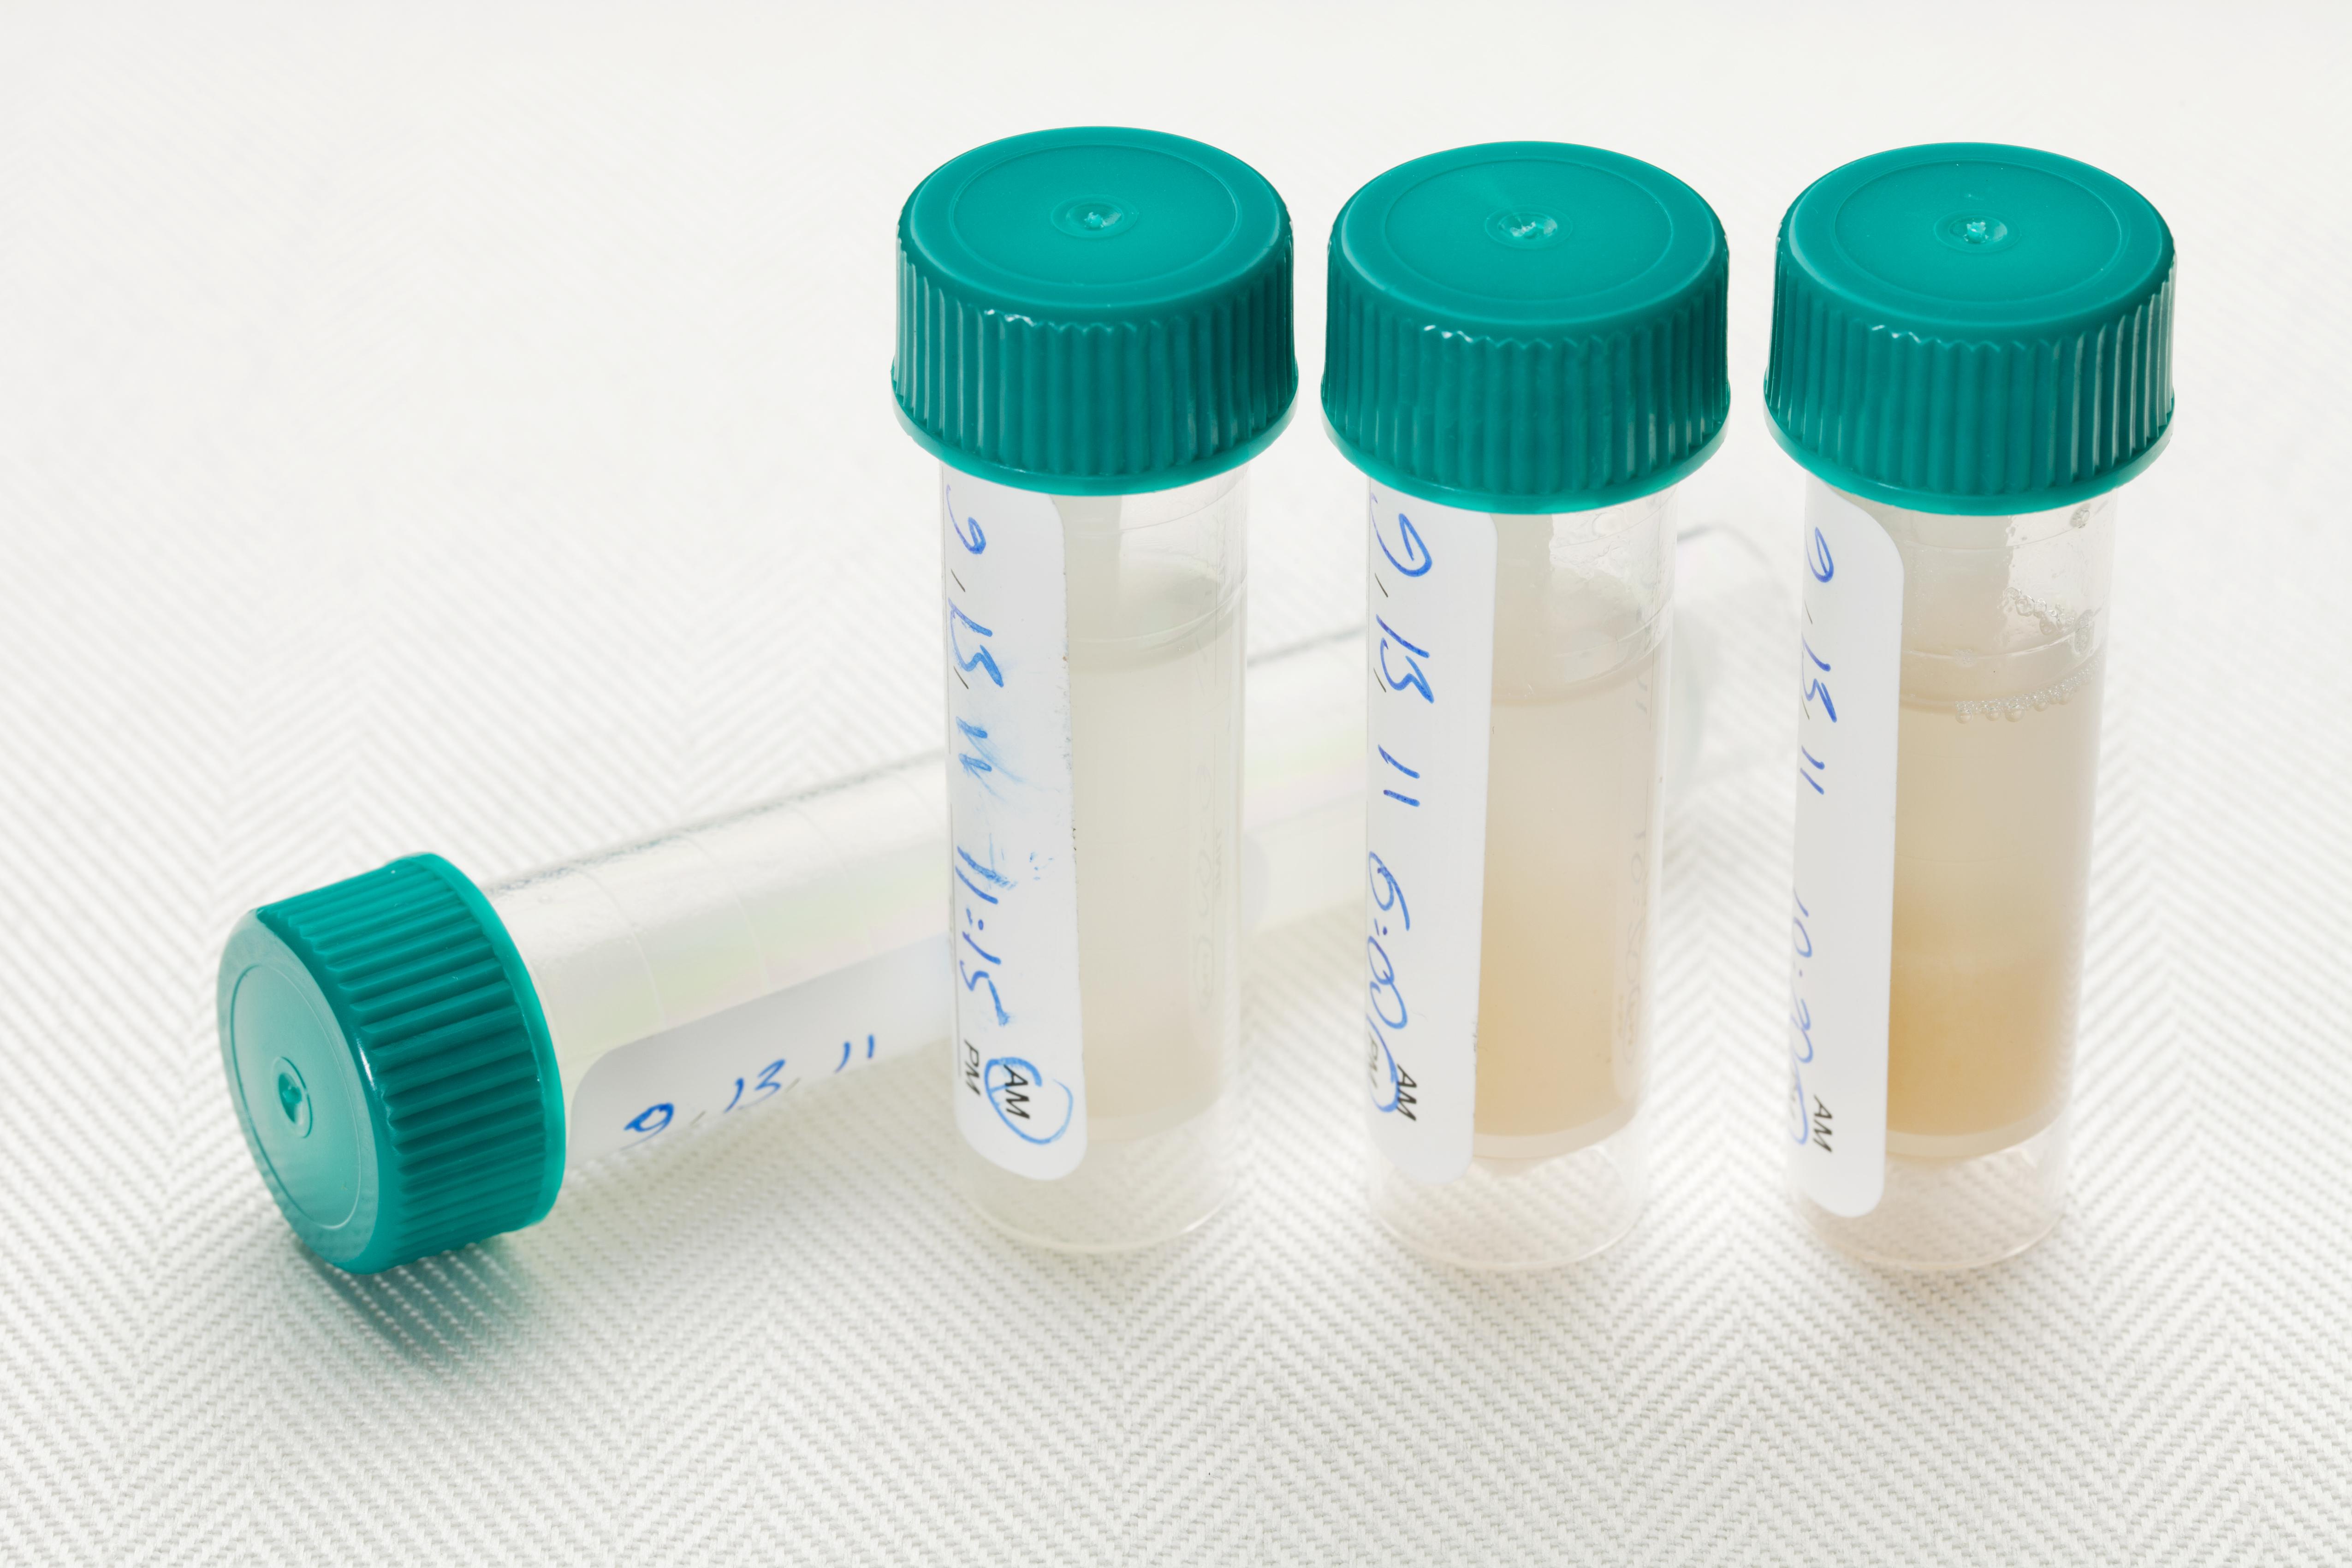 Samples of saliva in plastic tubes.